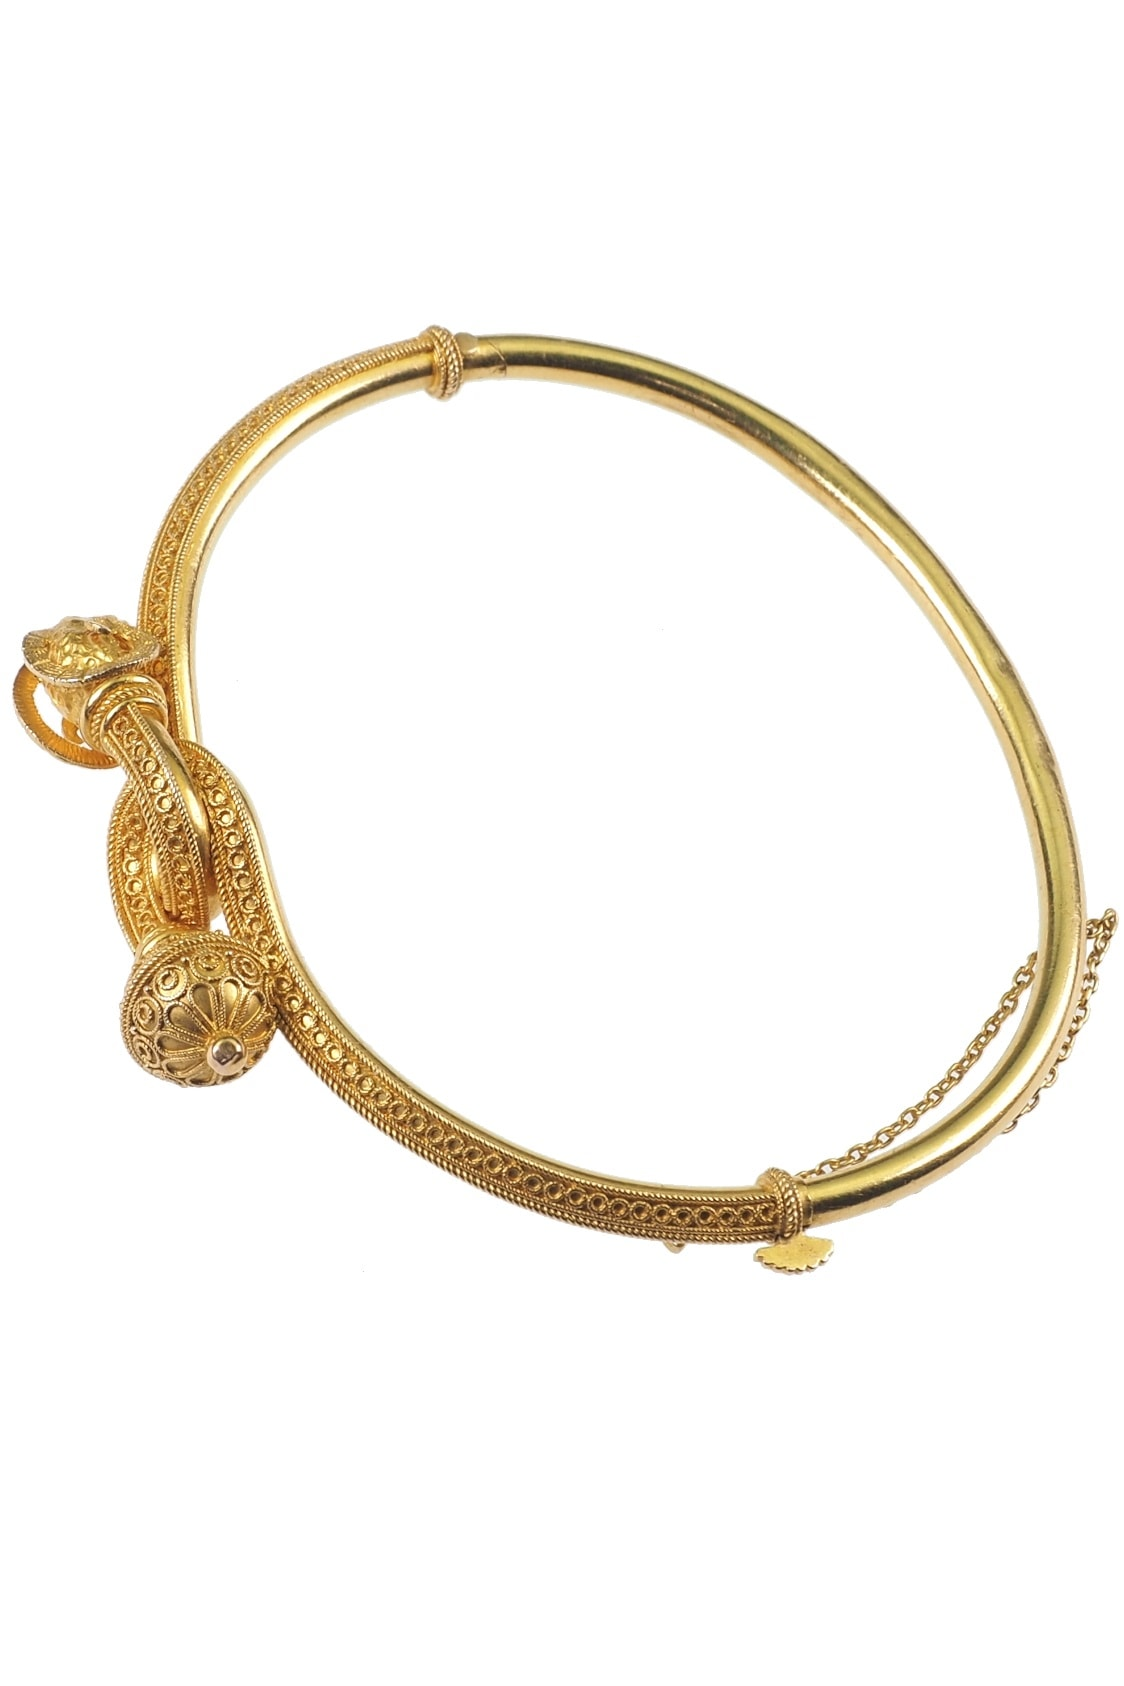 antike-Goldarmreifen-kaufen-2462c